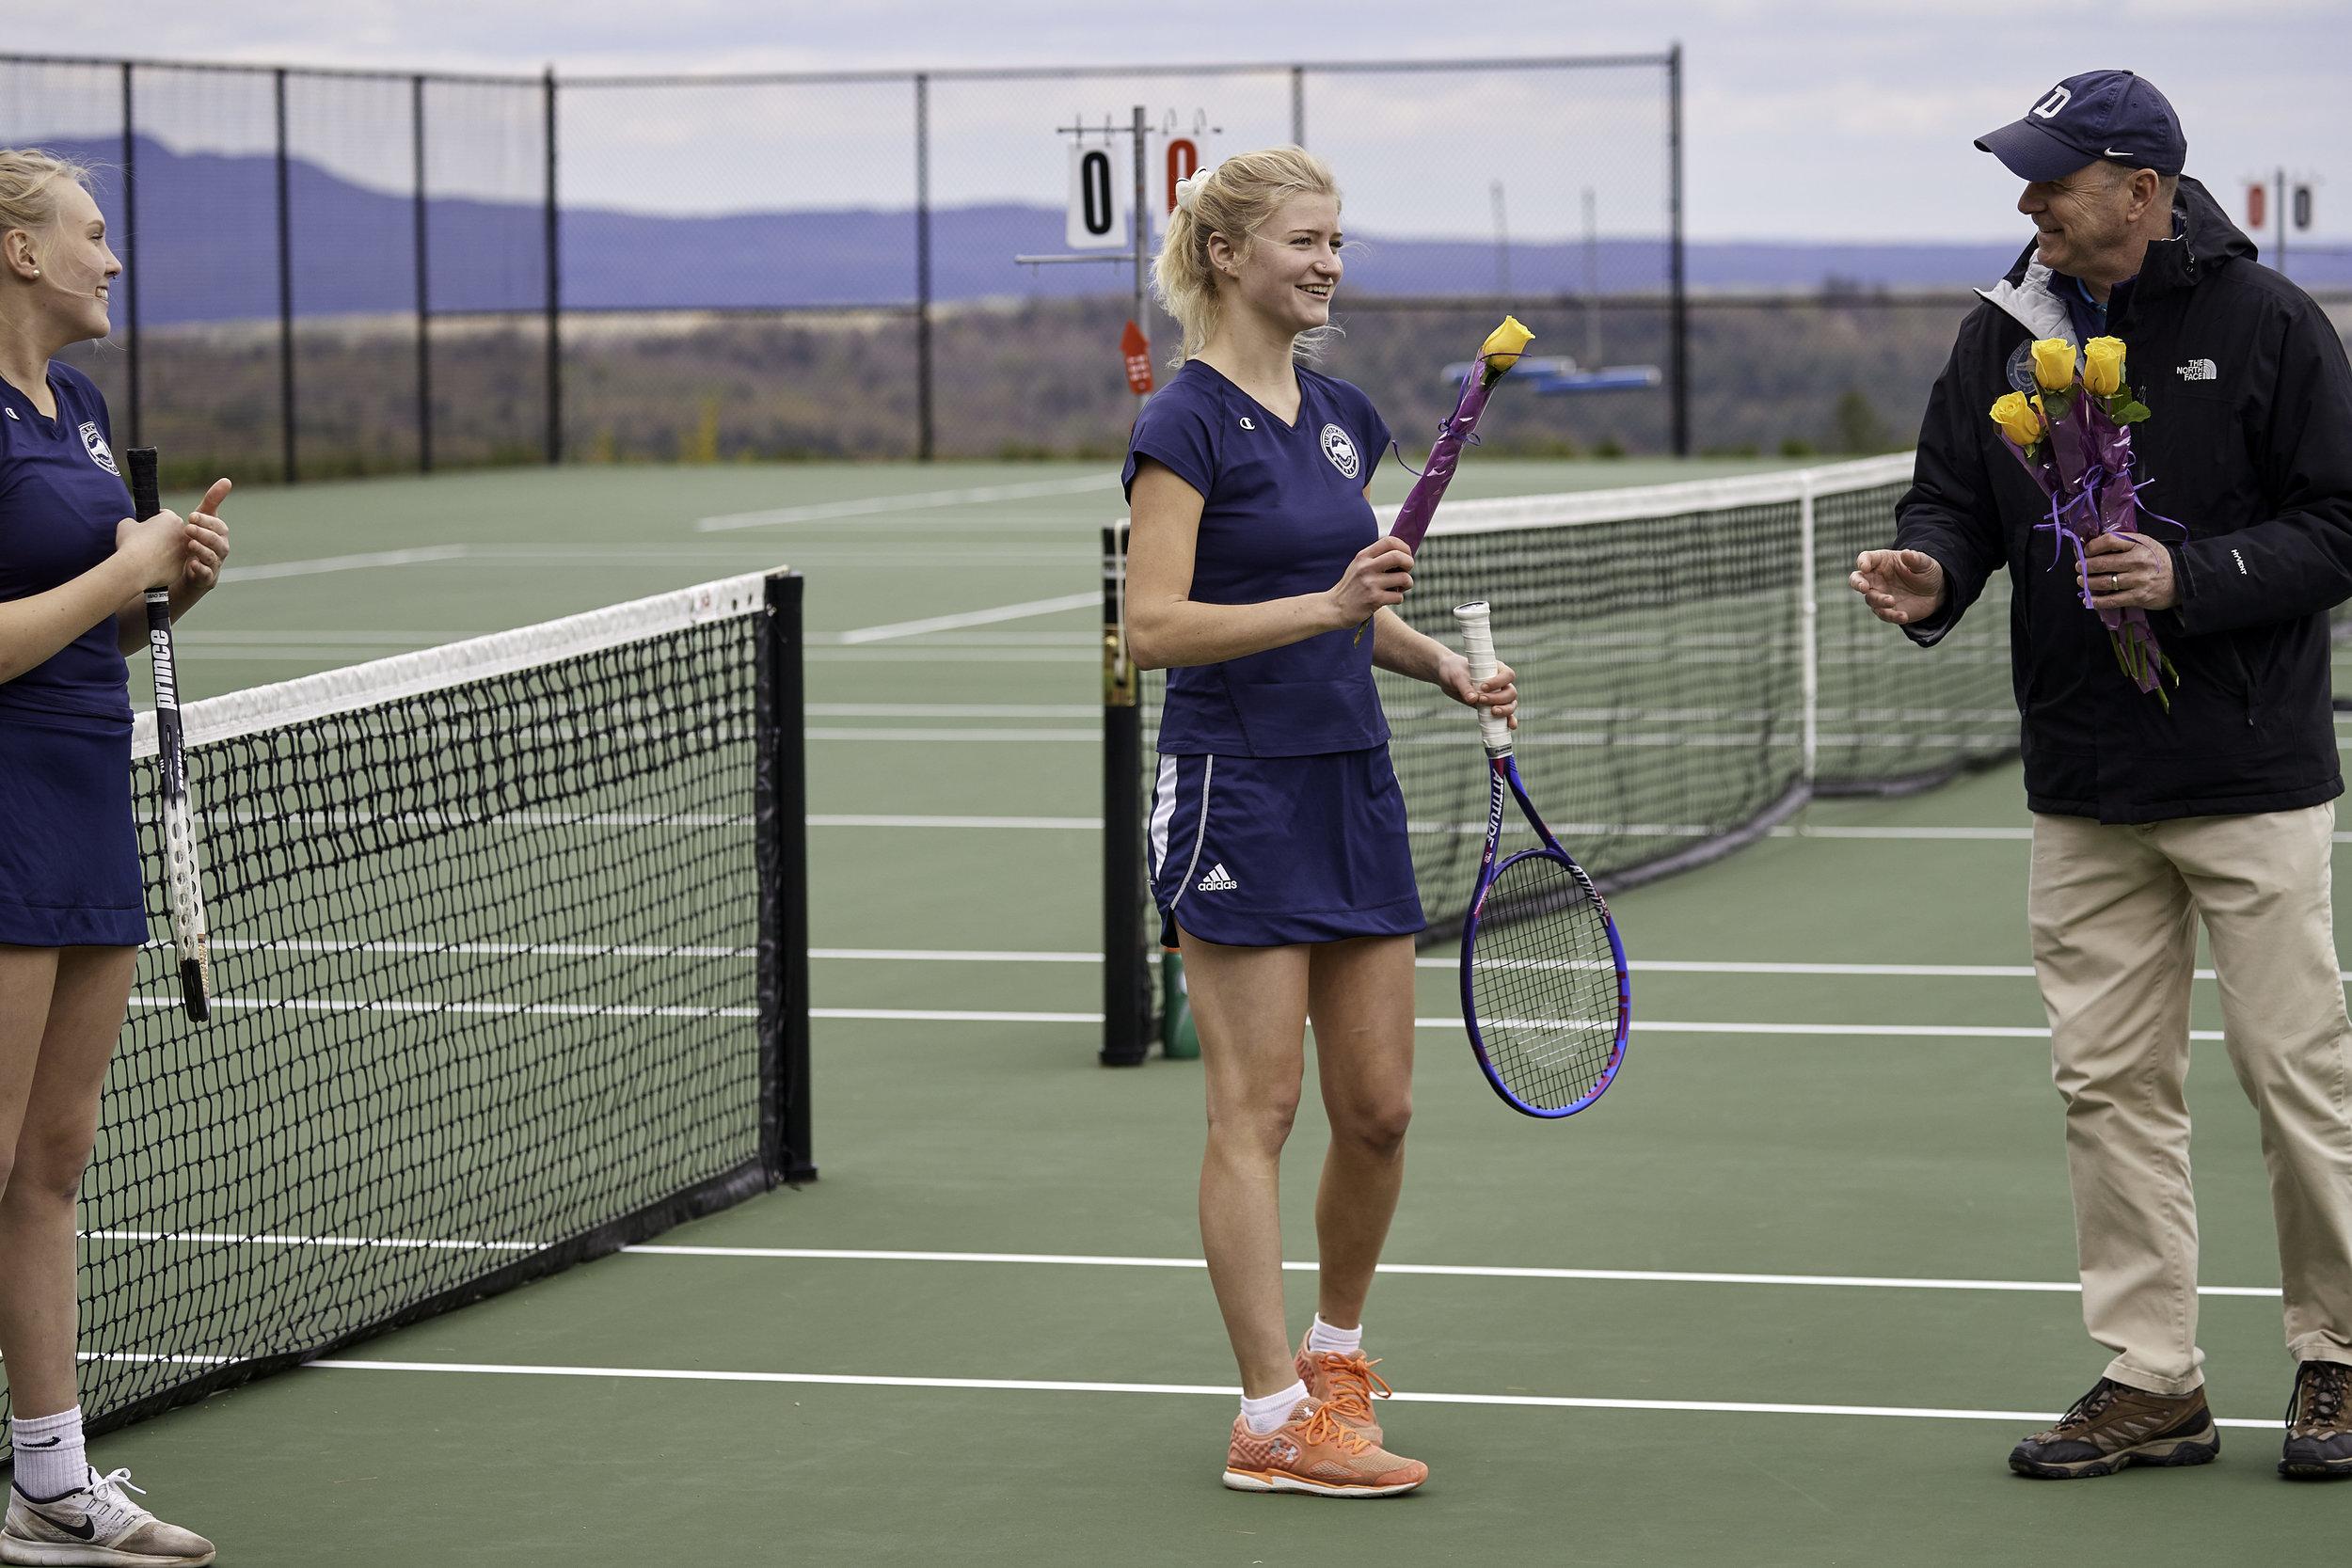 Girls Tennis vs. Winchendon School - May 15, 2019 -195125.jpg